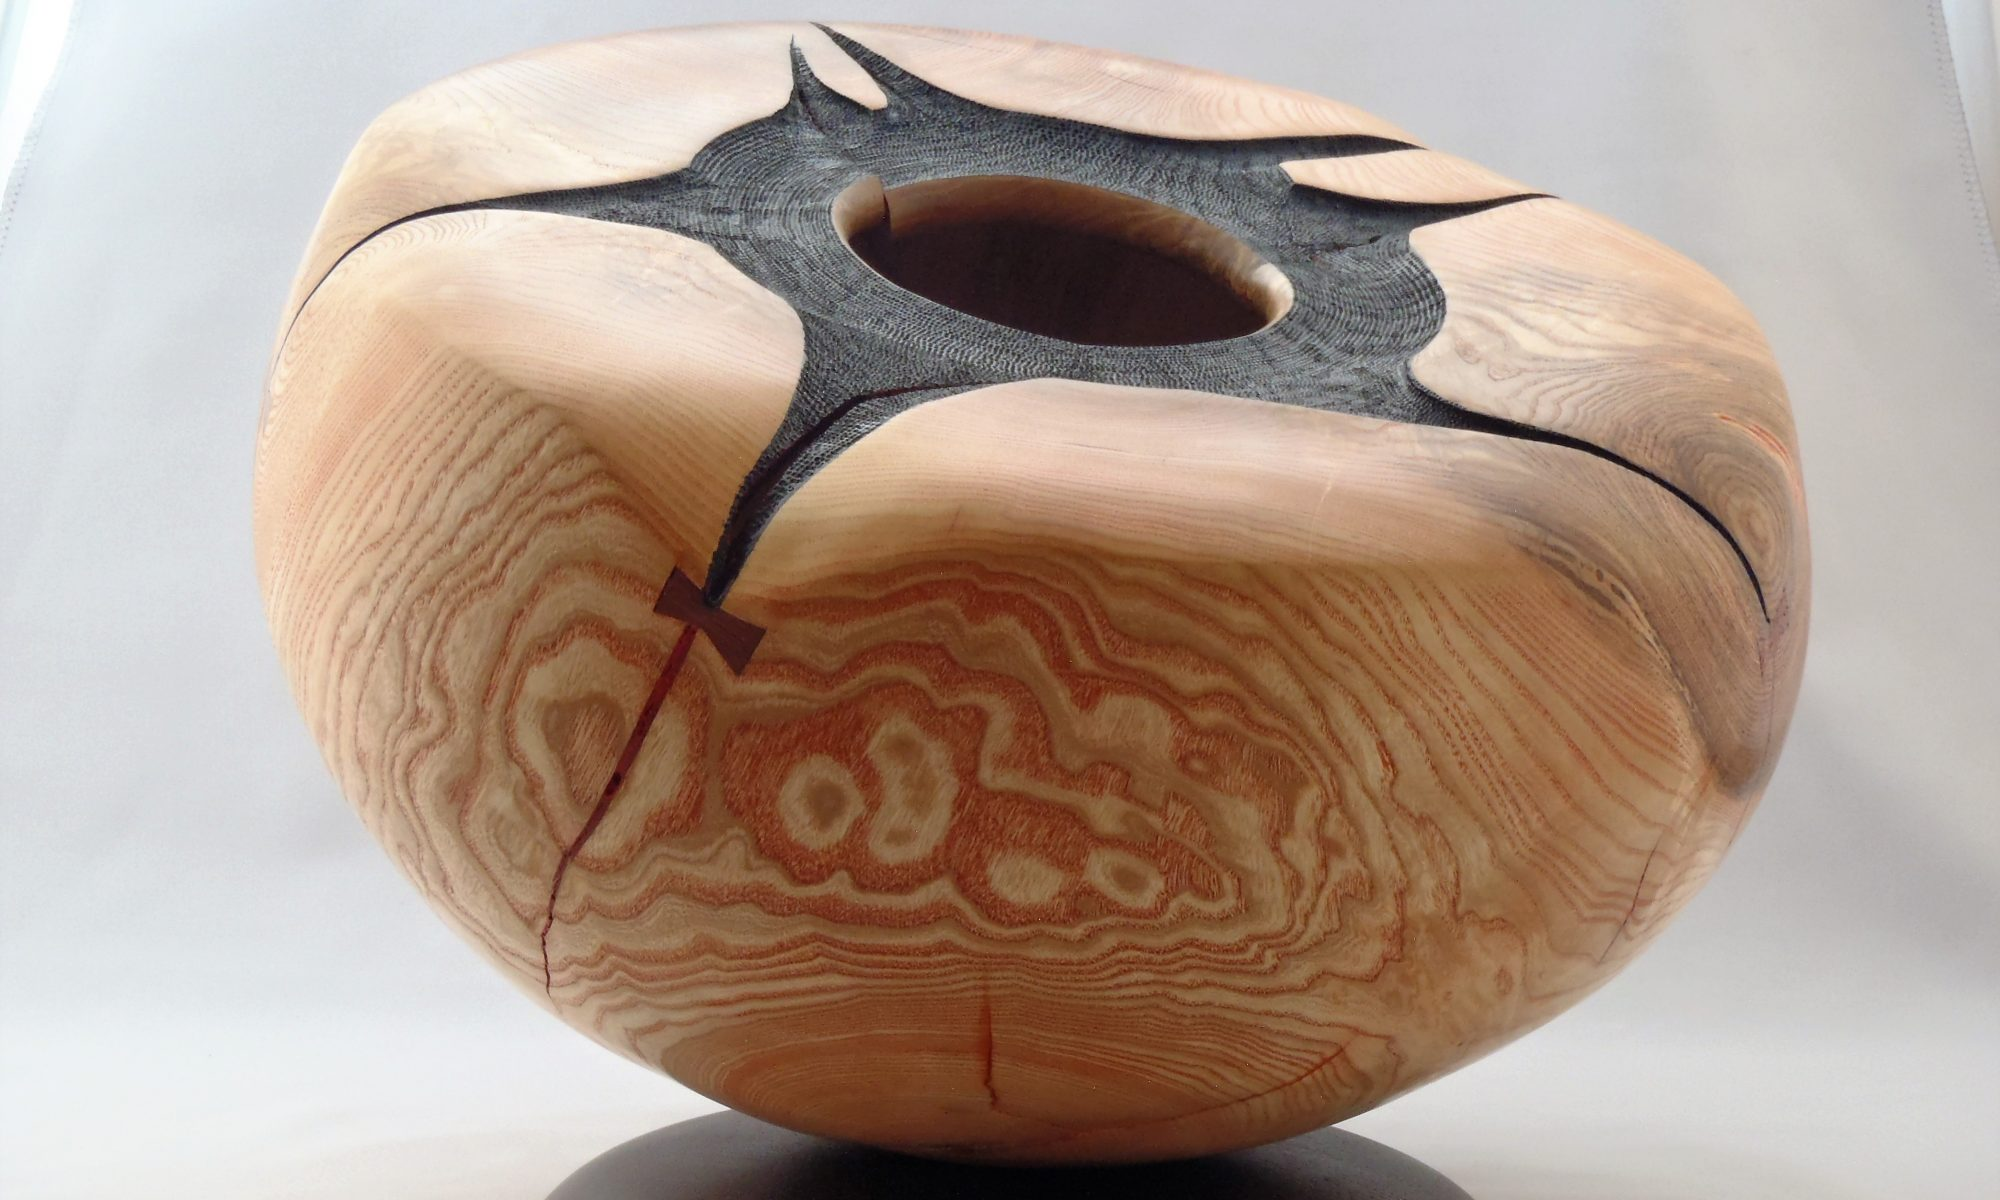 Reinhold Conrad's Woodform